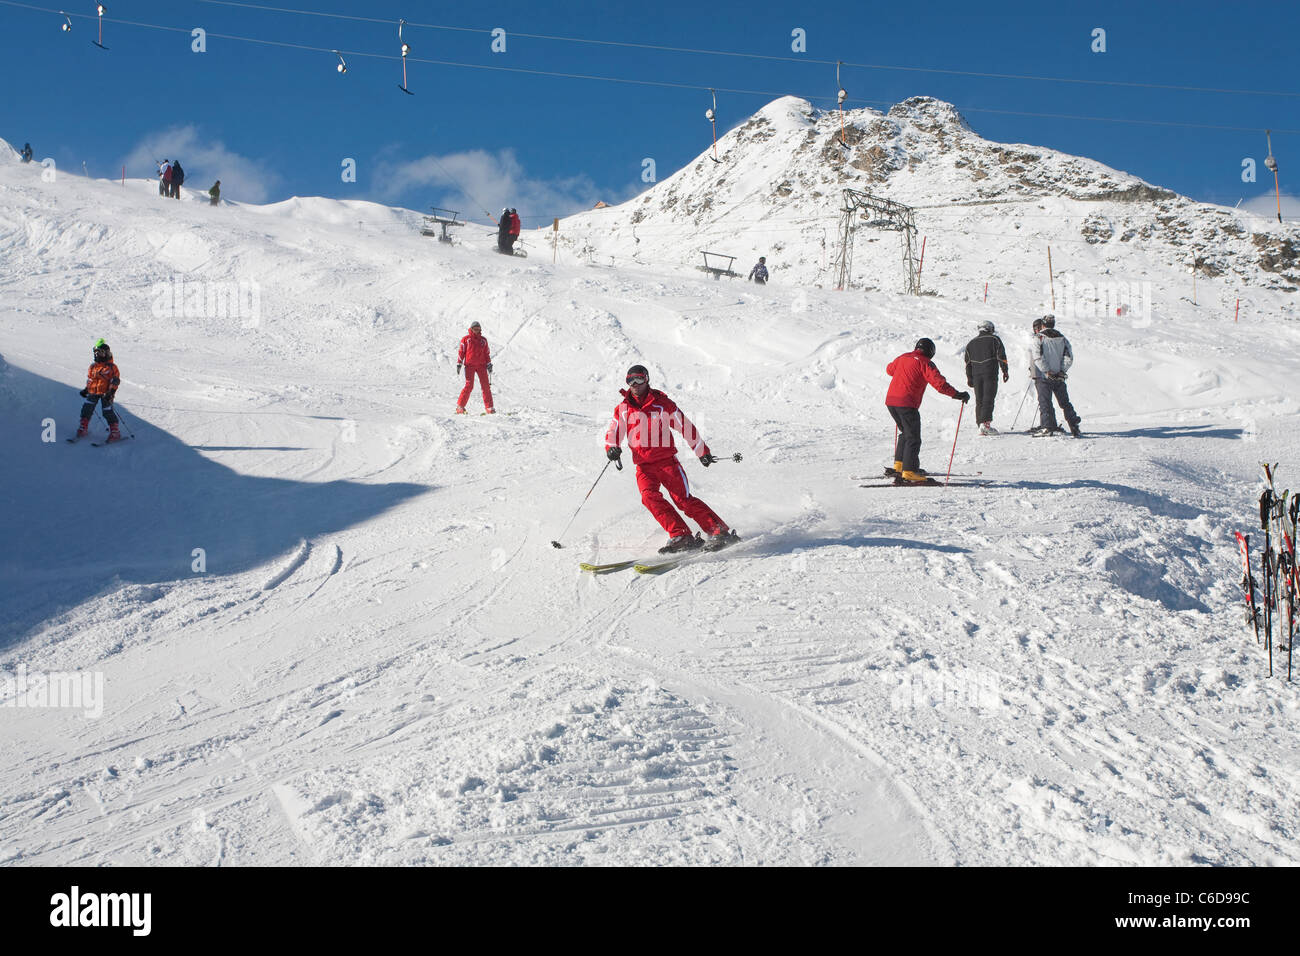 Hintertux Winter sport Wintersport skiing Ski skifahrer skifahren hiver Winterzeit Tirol Tyrol Alpen alps Hintertux - Stock Image